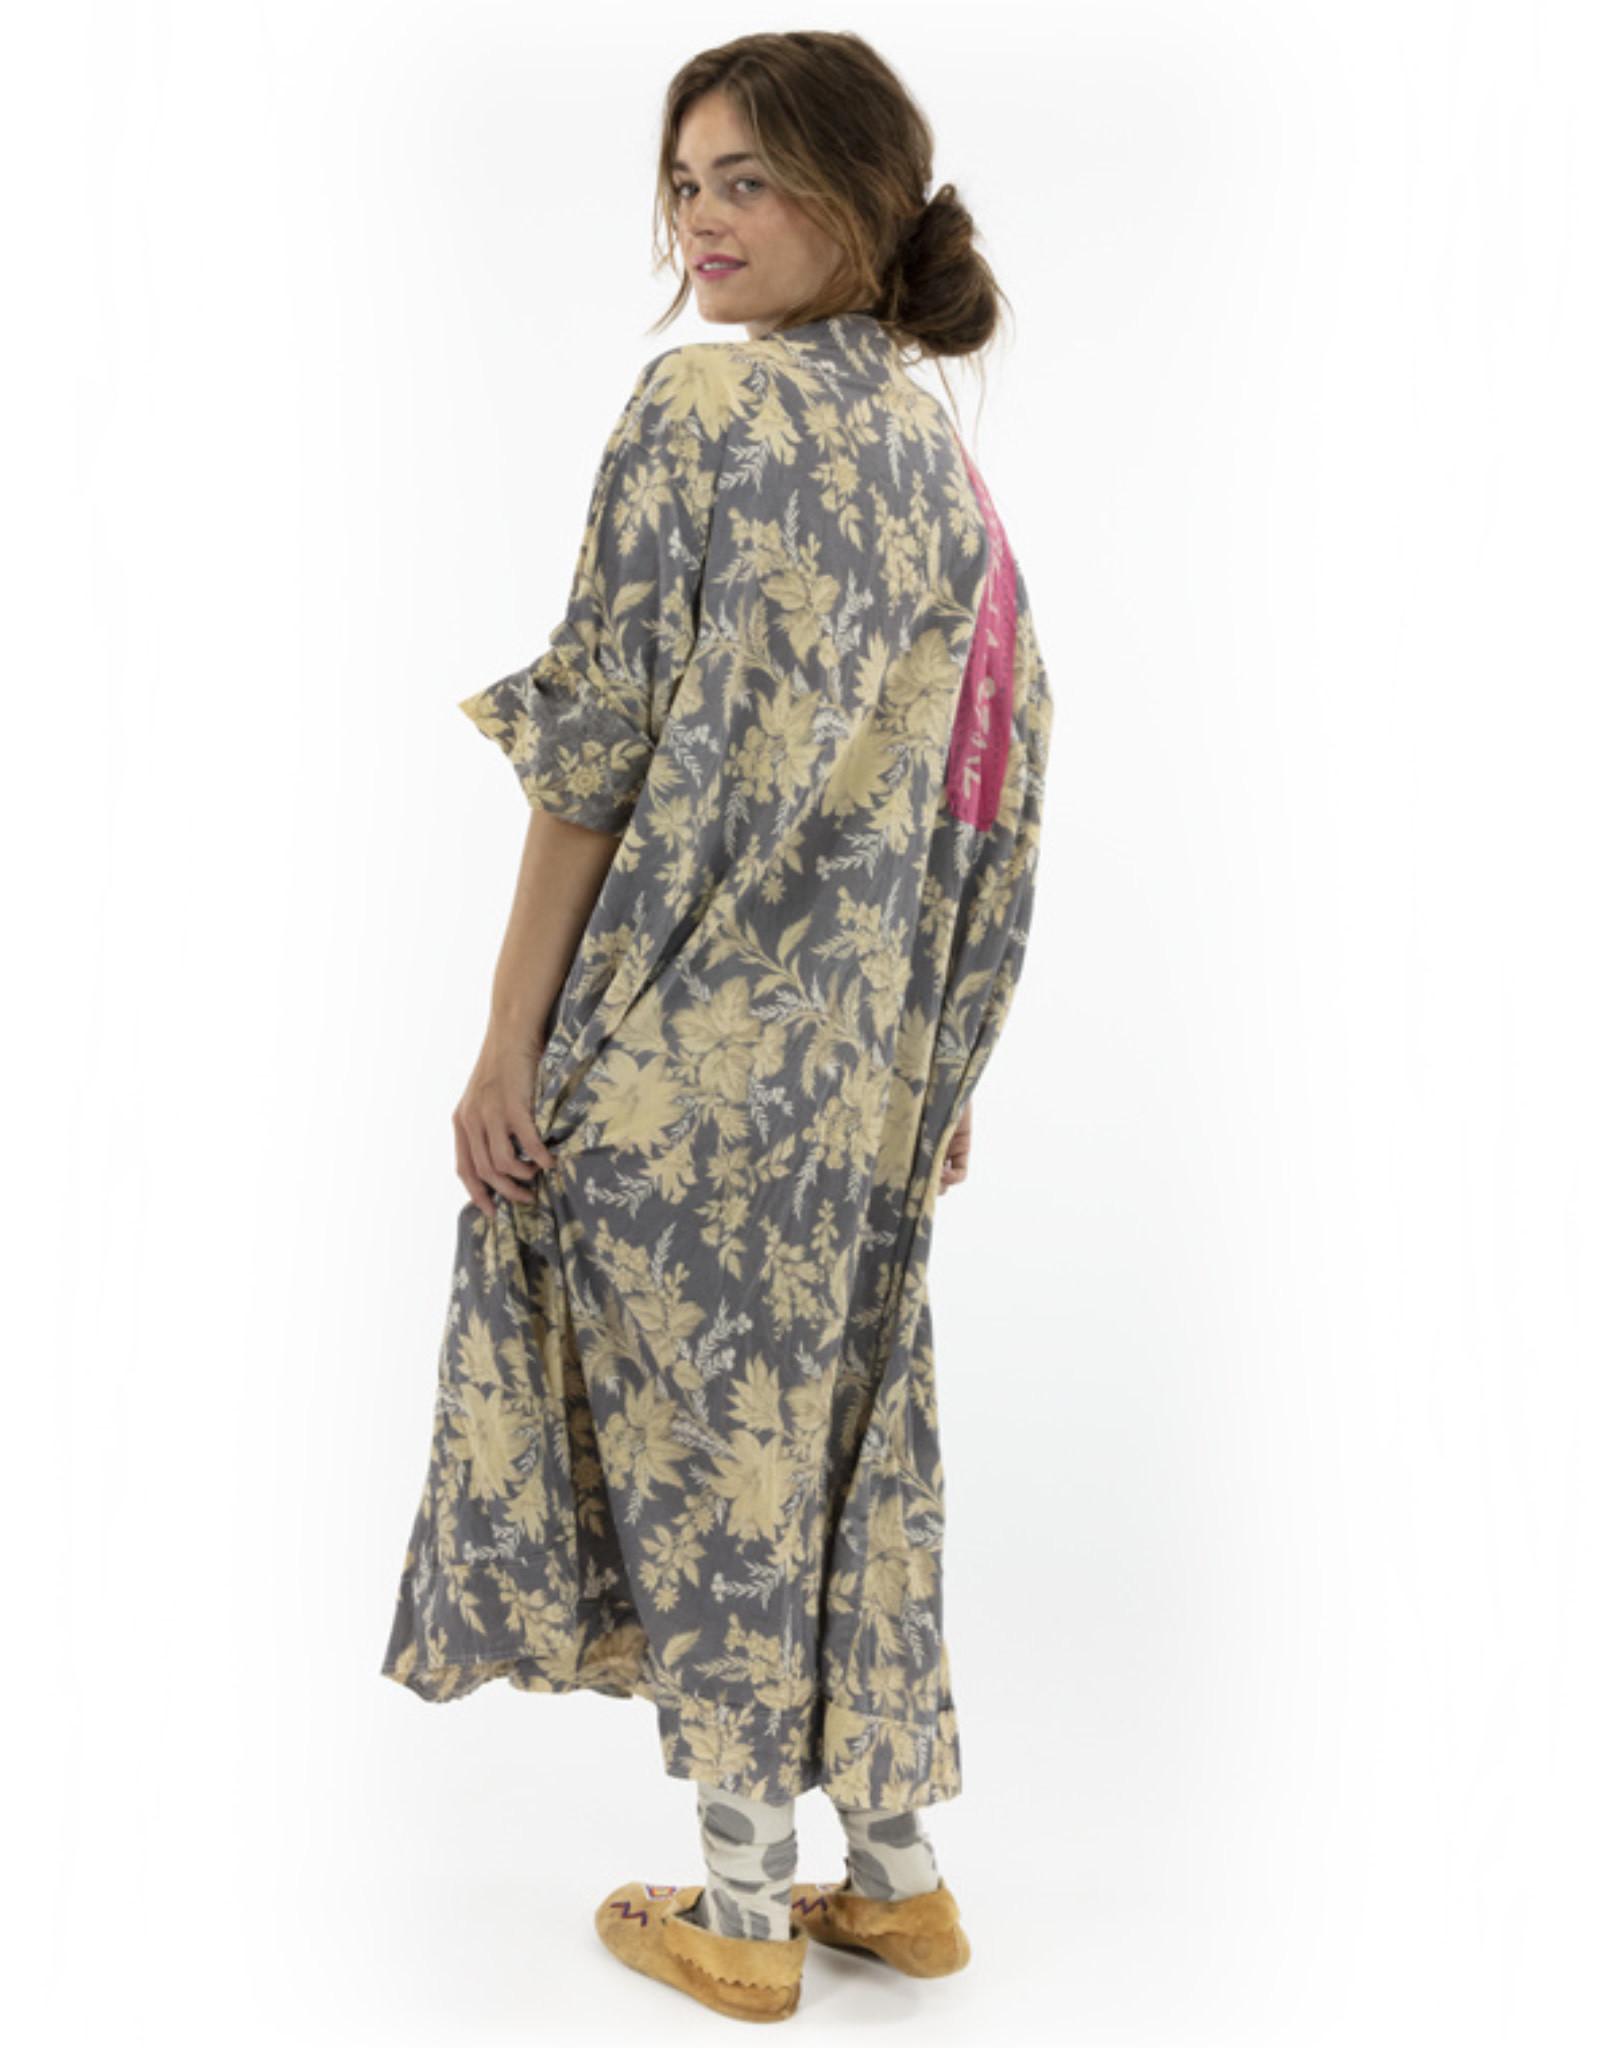 Magnolia Pearl Dress 773 (Phinn, O/S)